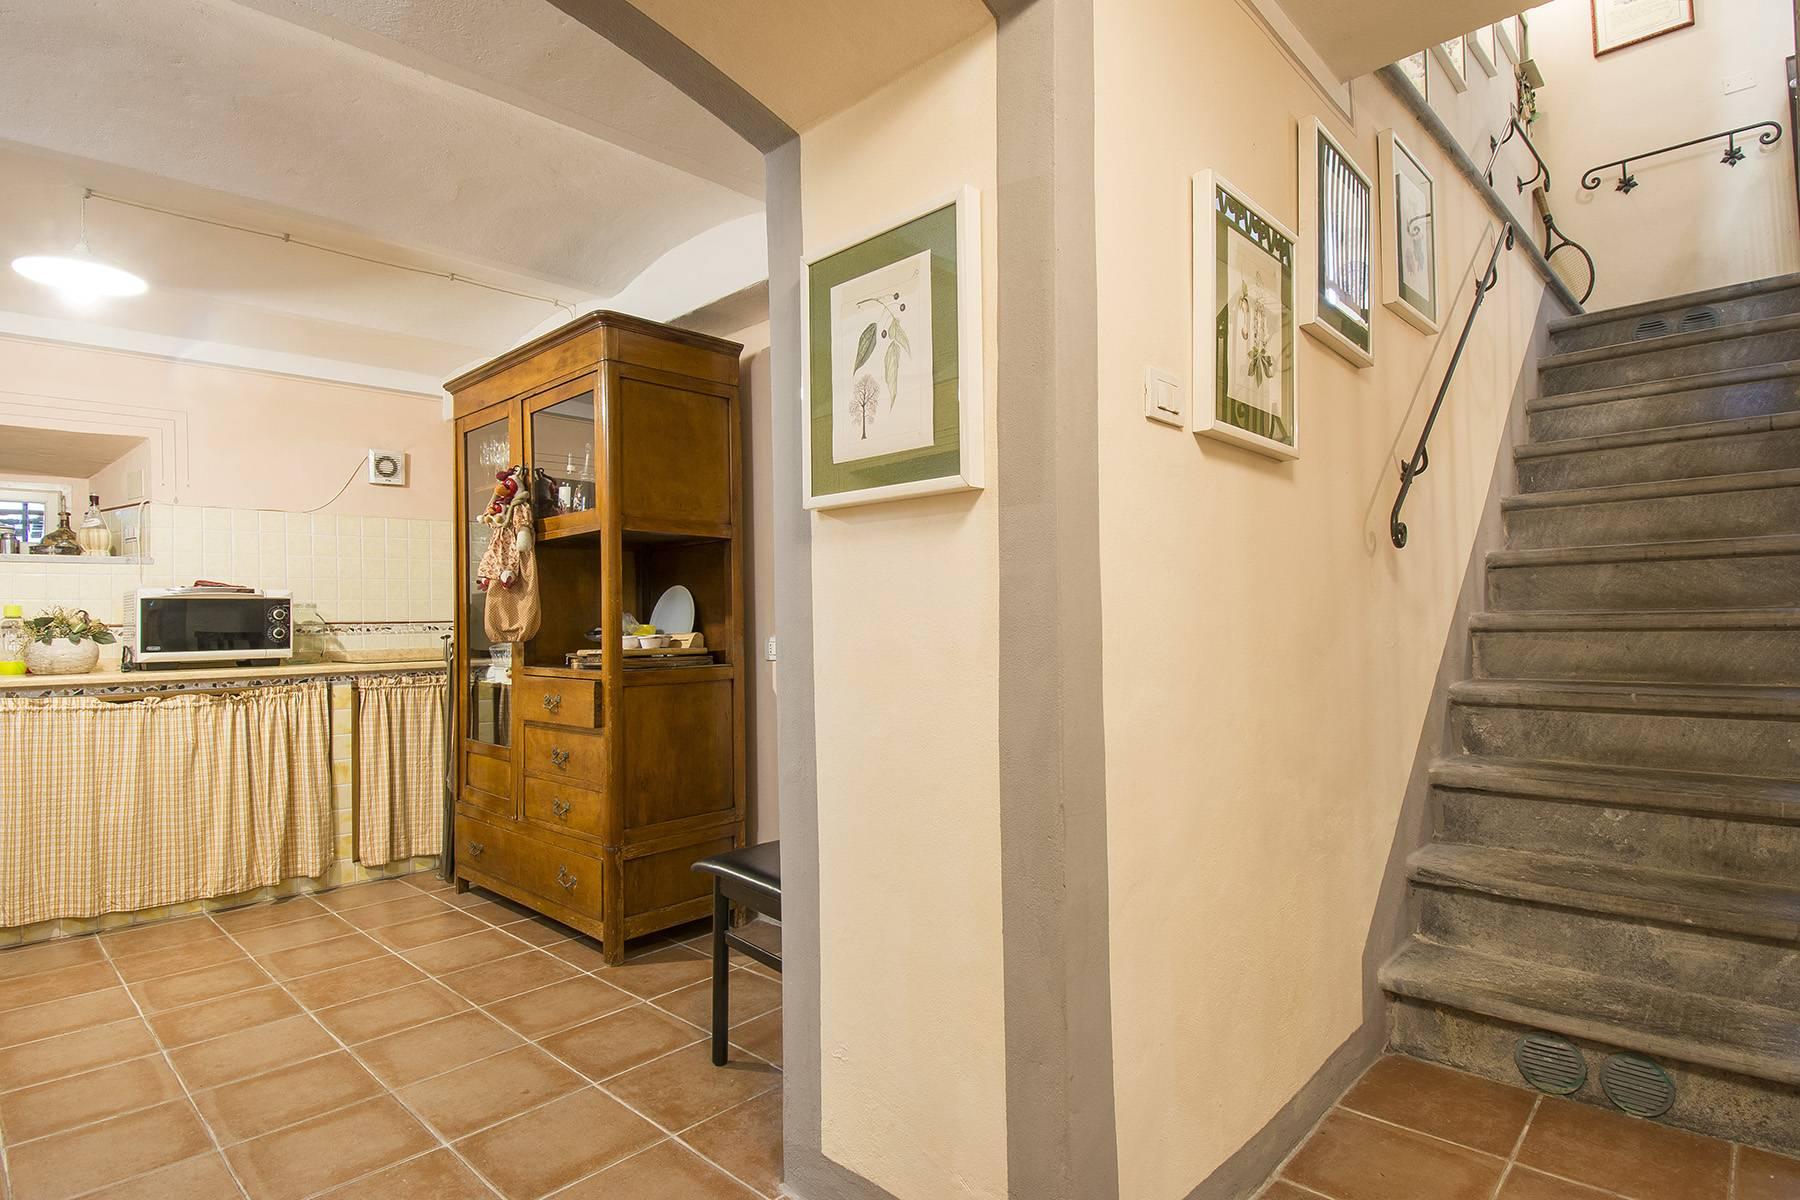 Villa in Vendita a Lucca: 5 locali, 350 mq - Foto 16